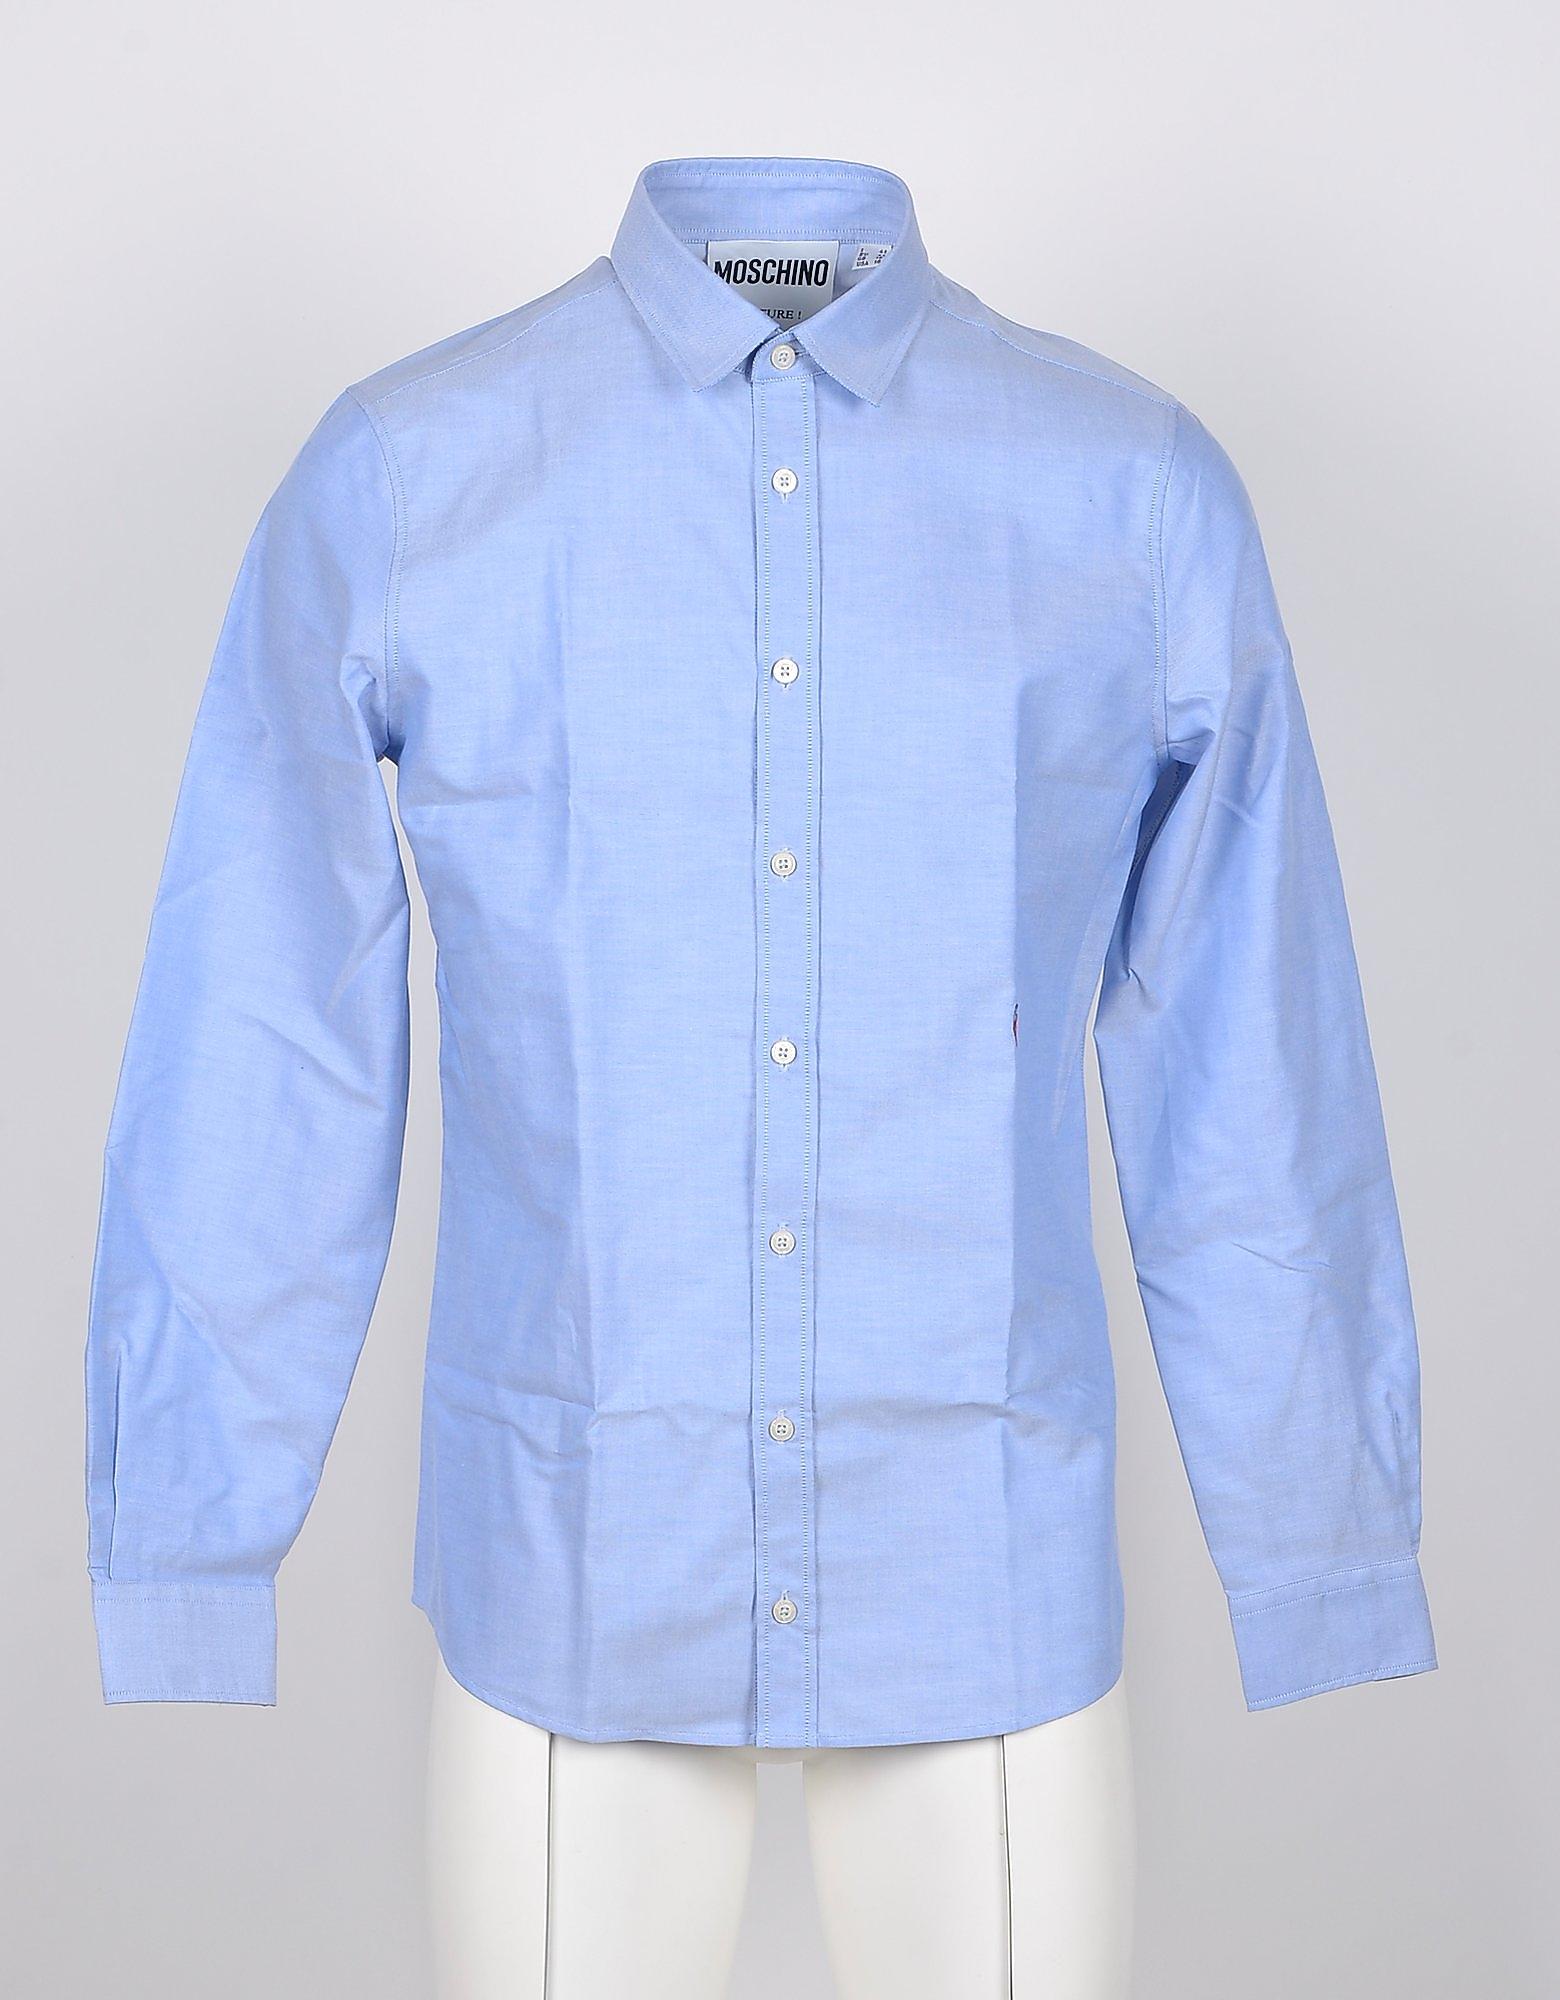 Moschino Designer Shirts, Light Blue Cotton Heart Embroidered Men's Shirt